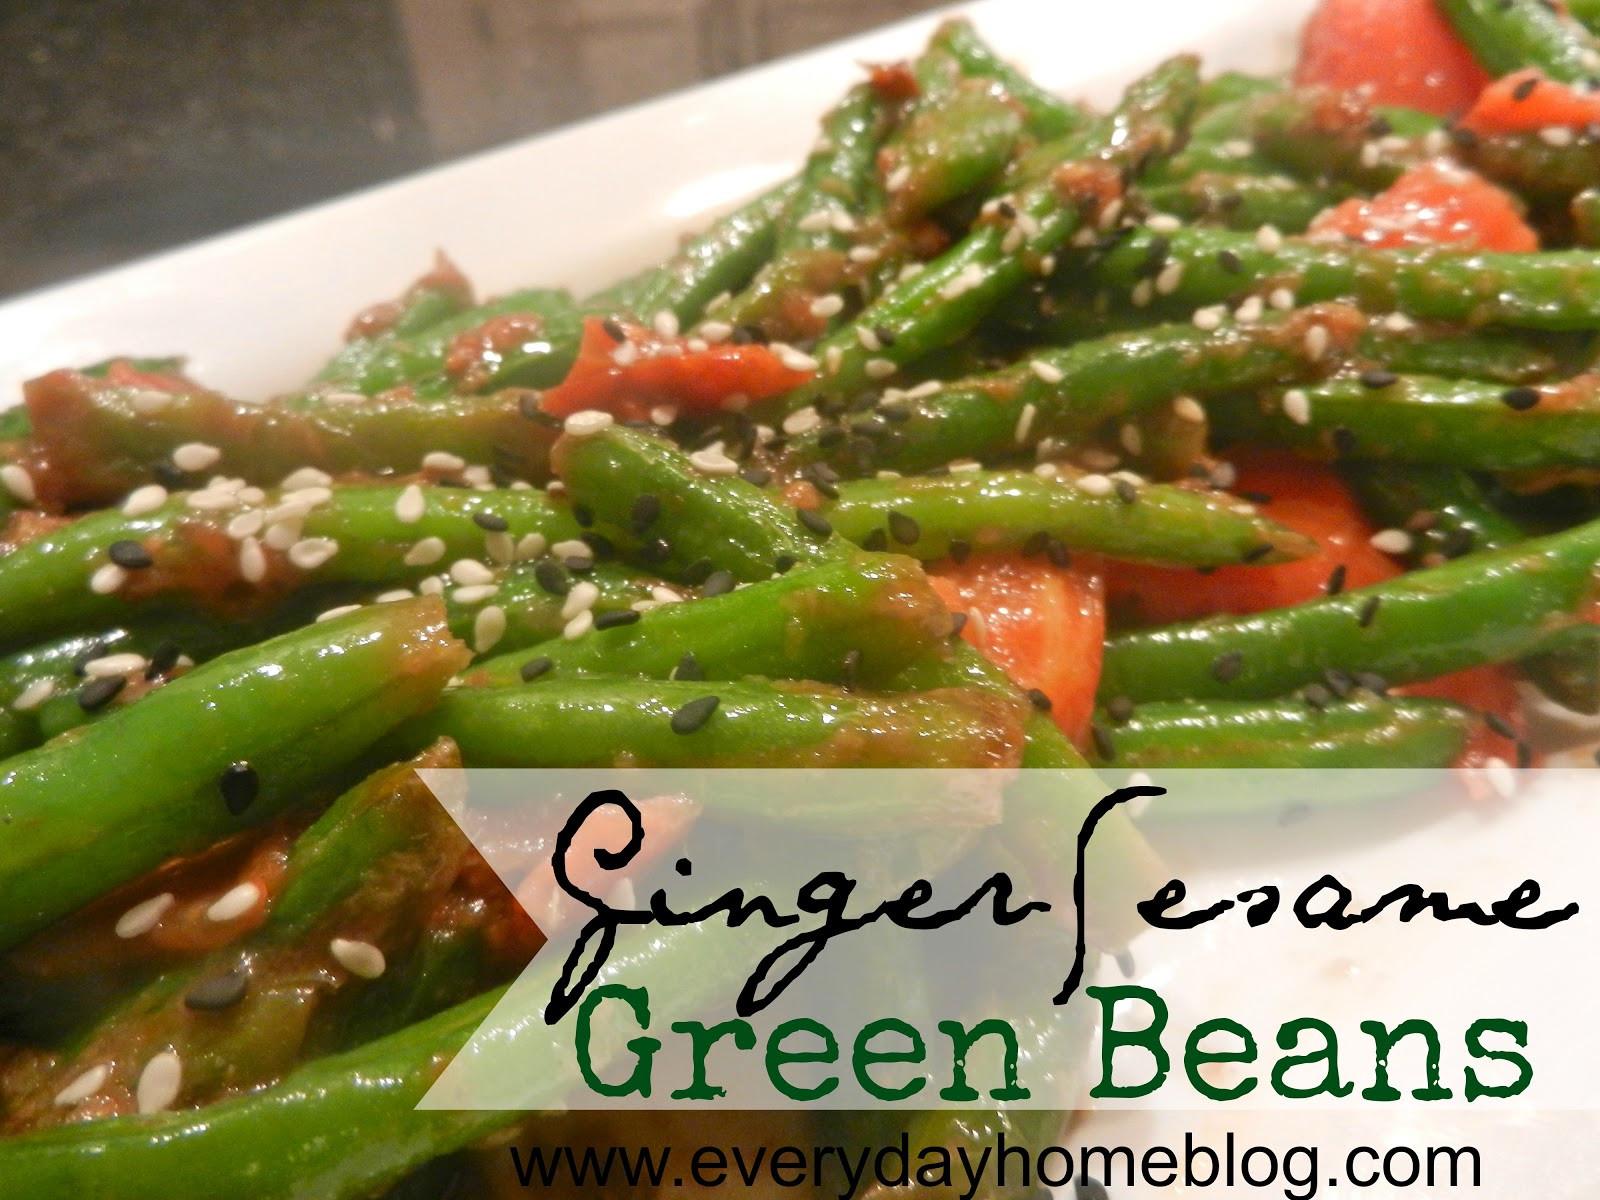 Healthy Green Bean Recipes  Healthy Green Bean Recipe Tasty Tuesday The Everyday Home